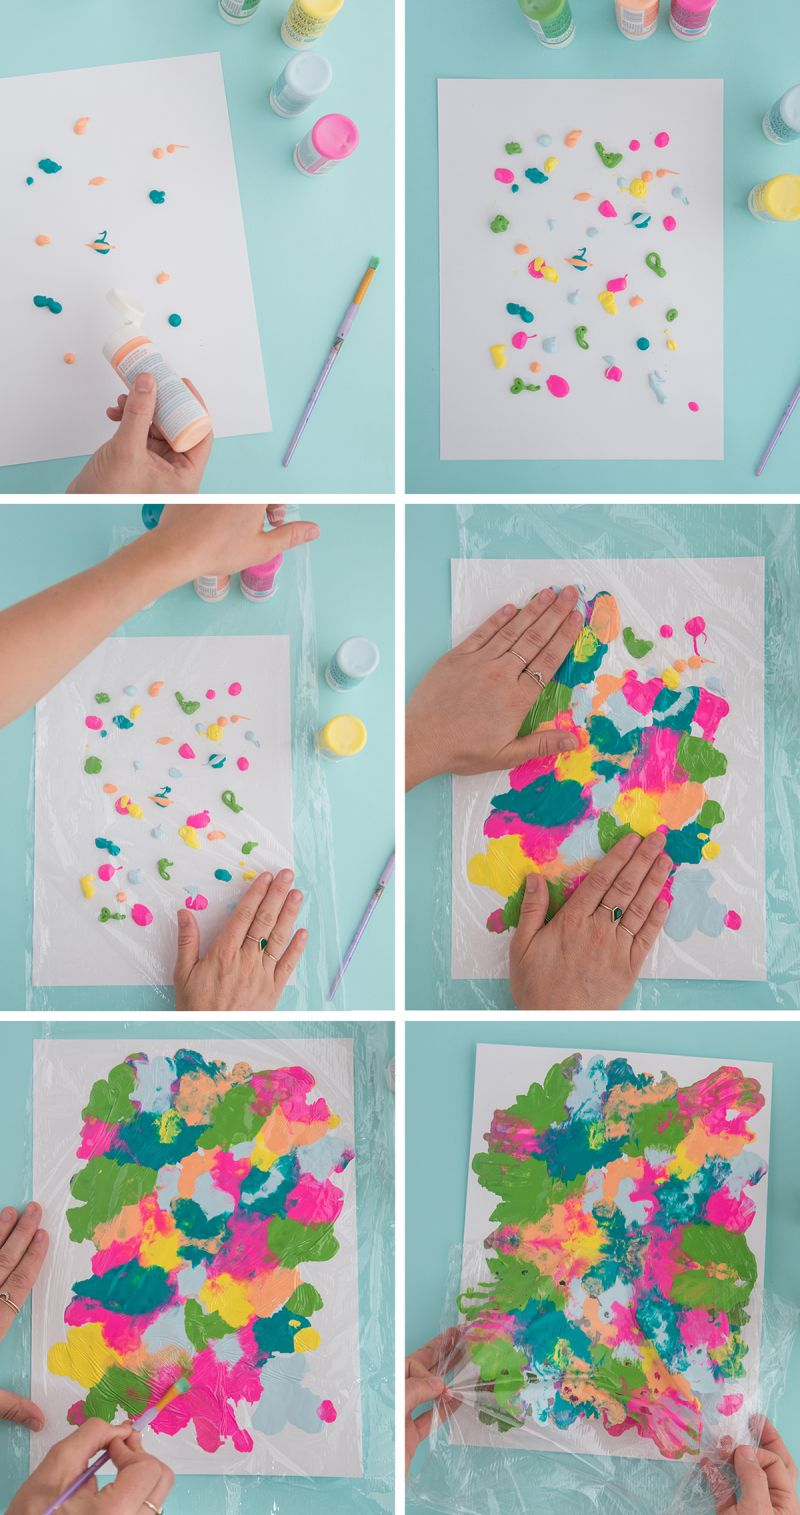 2018 07 24 Smooshed Paint Kid Activity 8 Blog Art For Kids